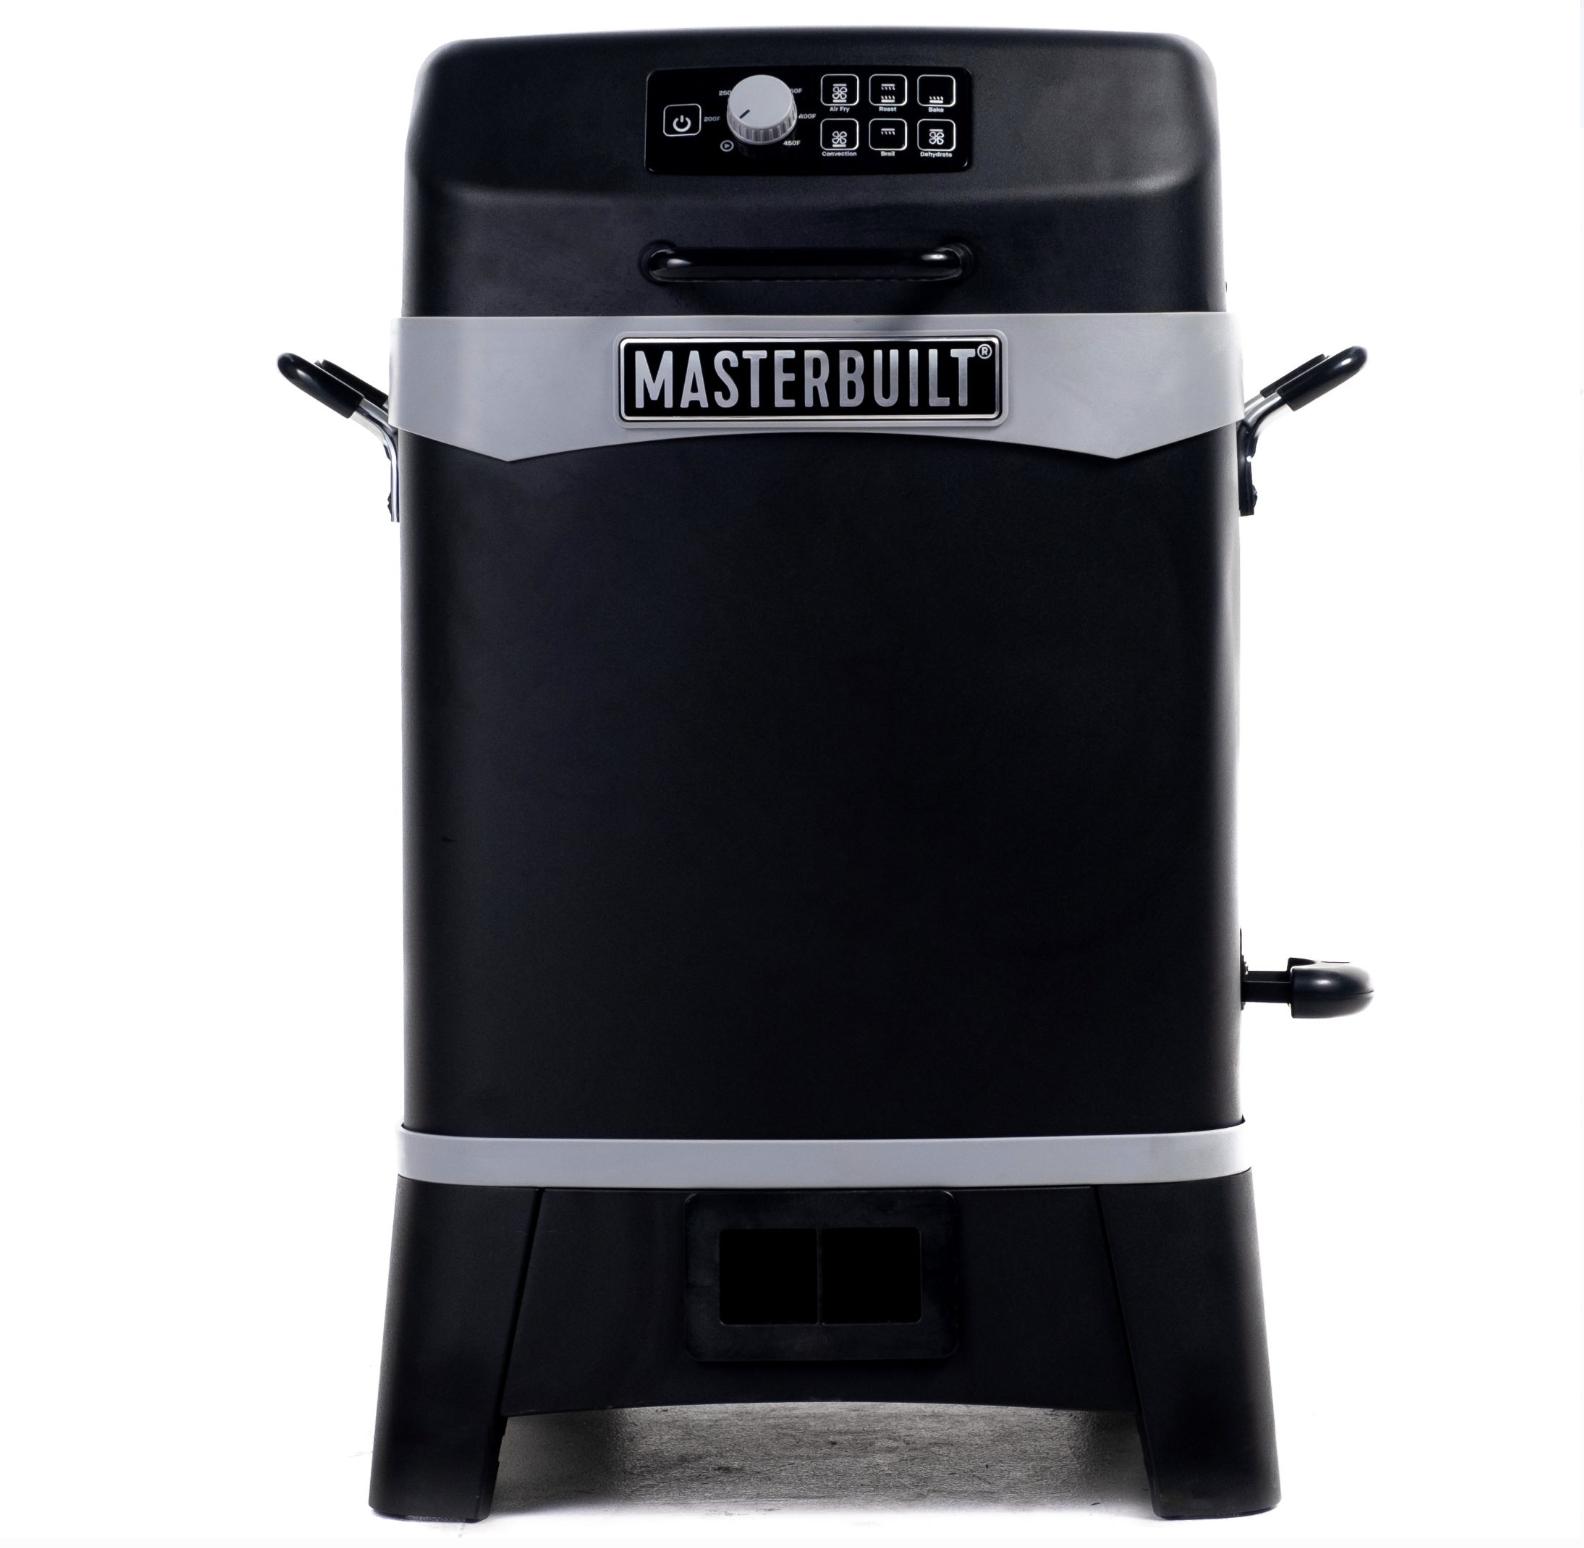 🔥 Masterbuilt Outdoor Air Fryer 7-in-1 Turkey Bake Roast